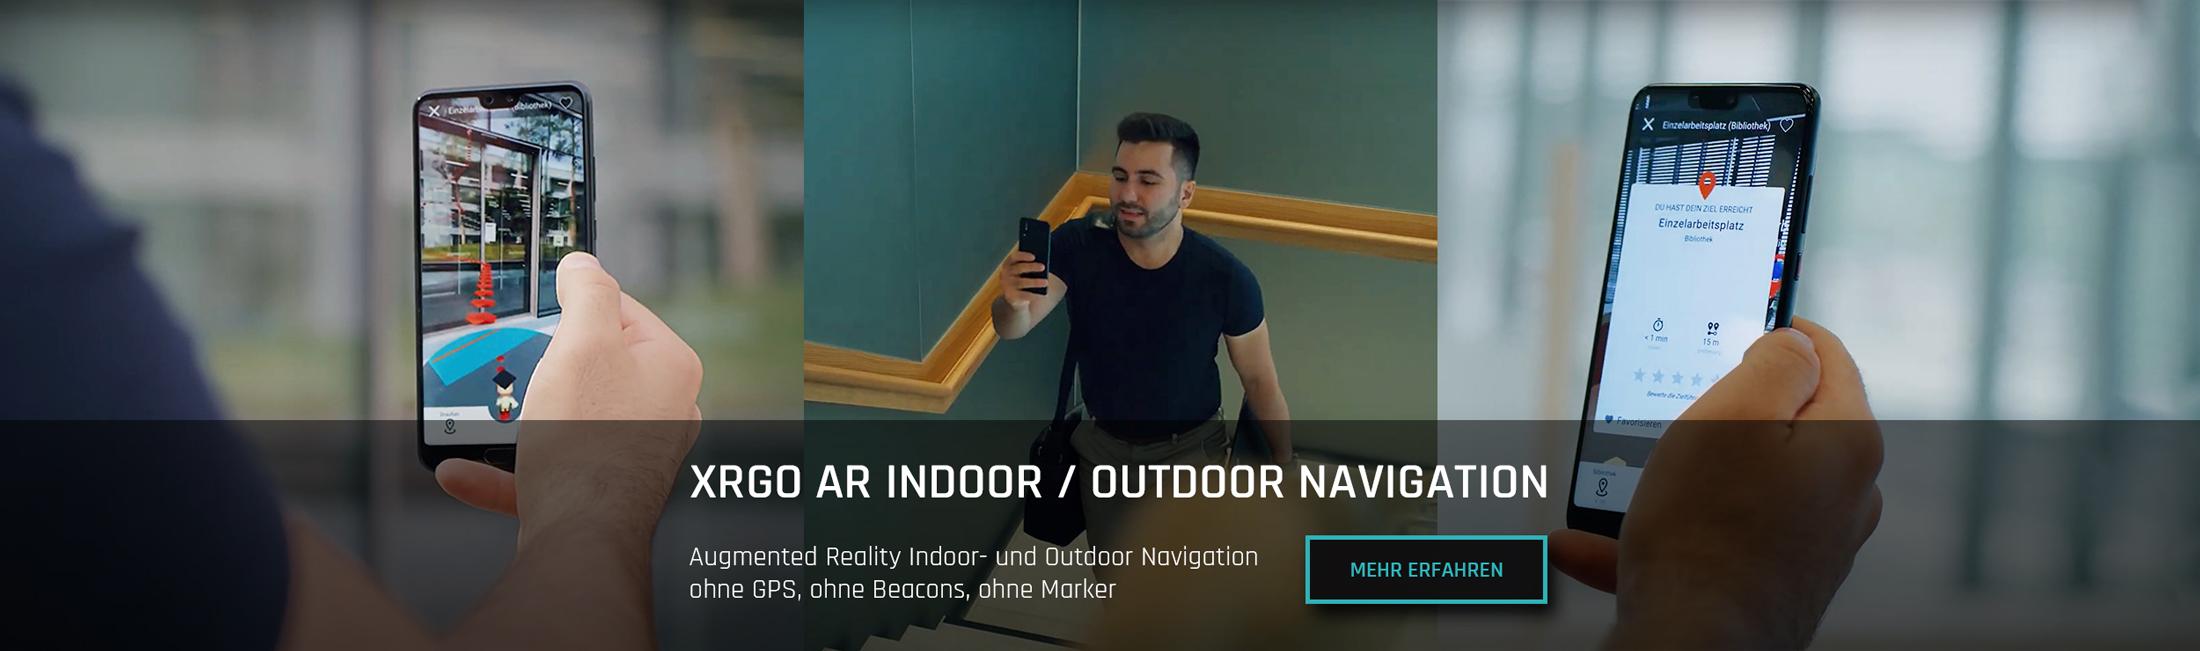 XRGO AR Navigation